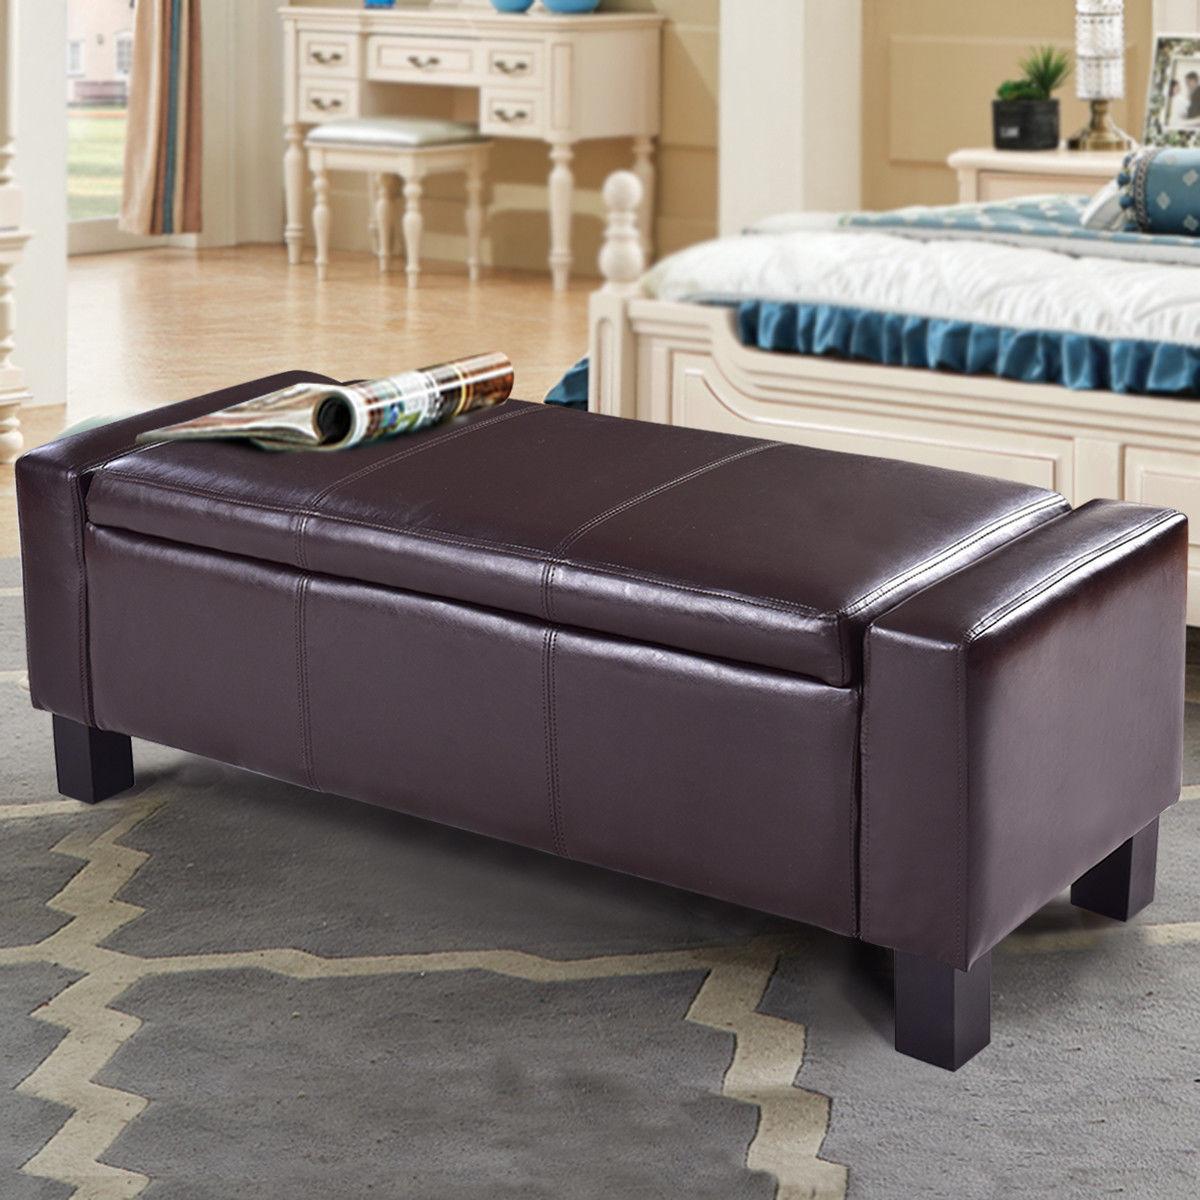 PU Leather Ottoman Bench Storage Chest Footstool Organizer Chair Furniture Brown